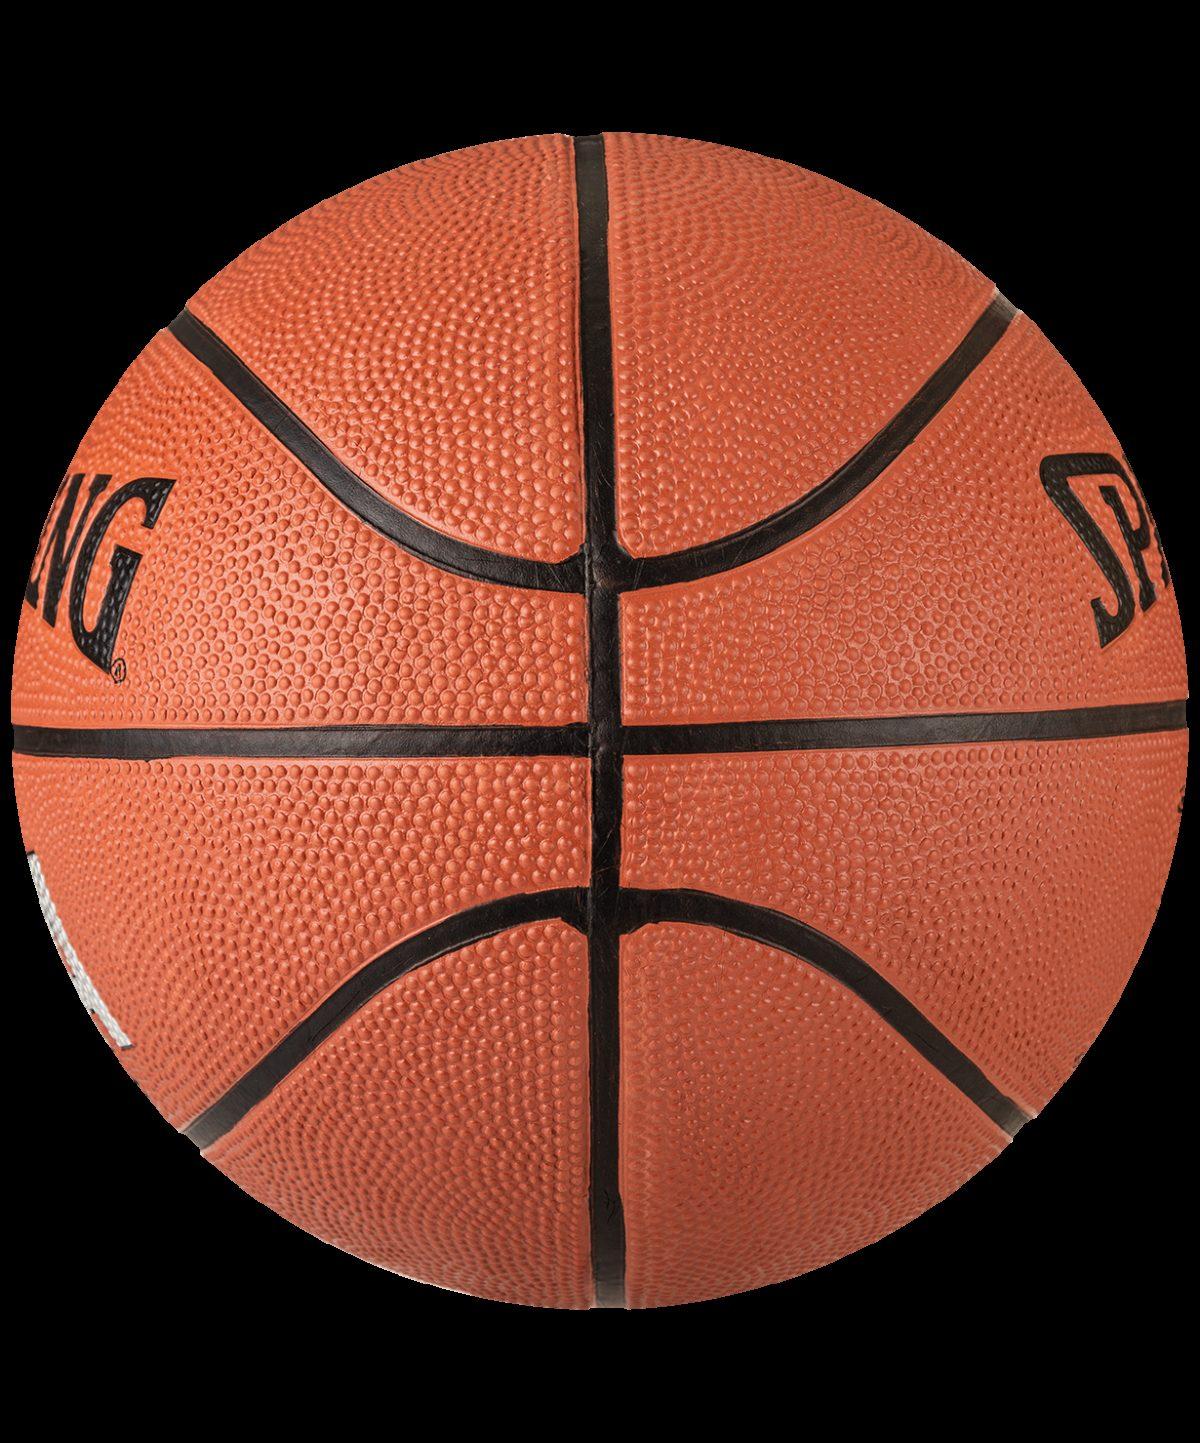 SPALDING NBA Silver мяч баскетбольный №6 - 3